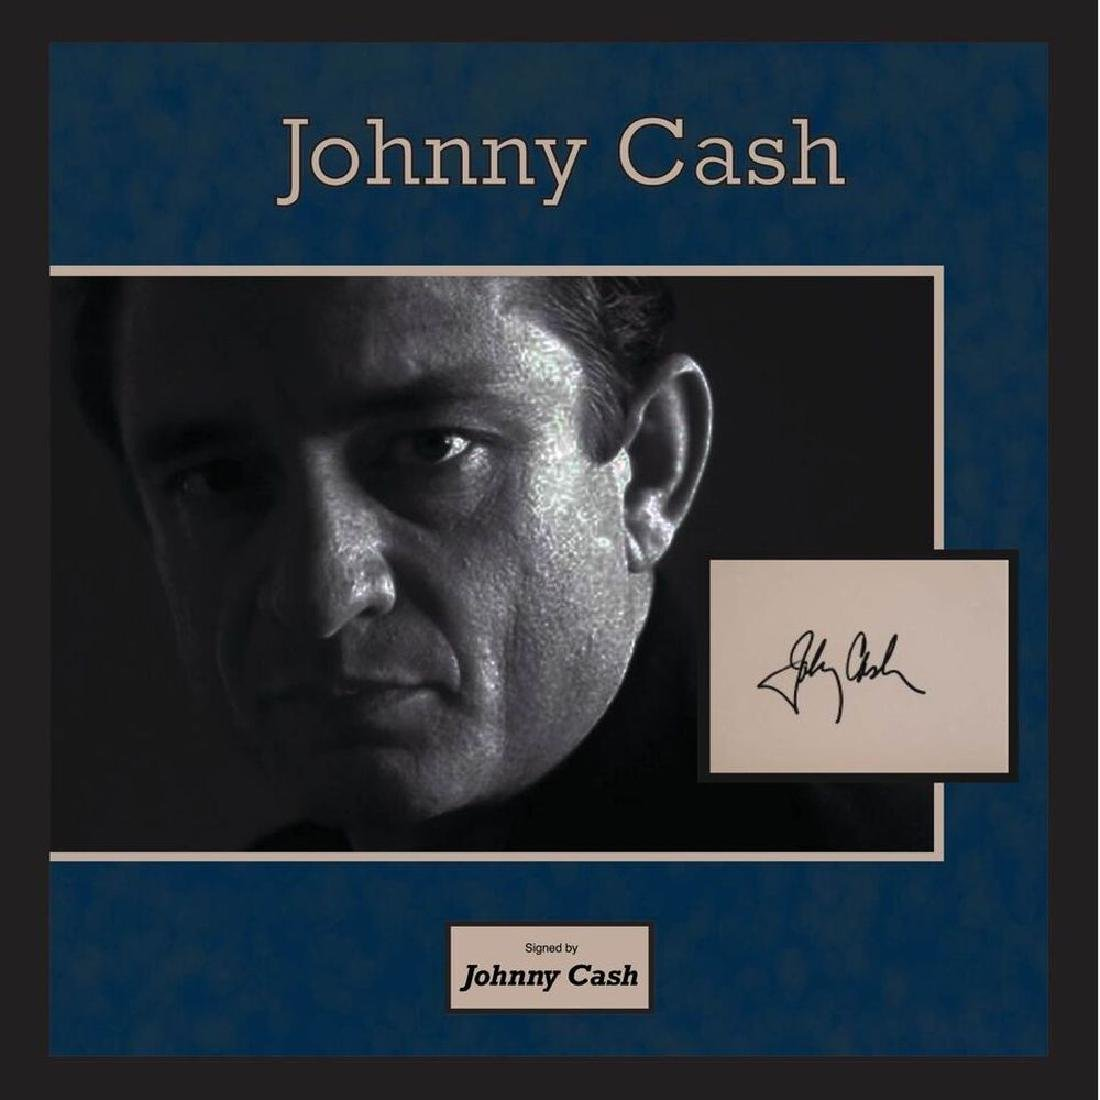 Johnny Cash Signature Cut